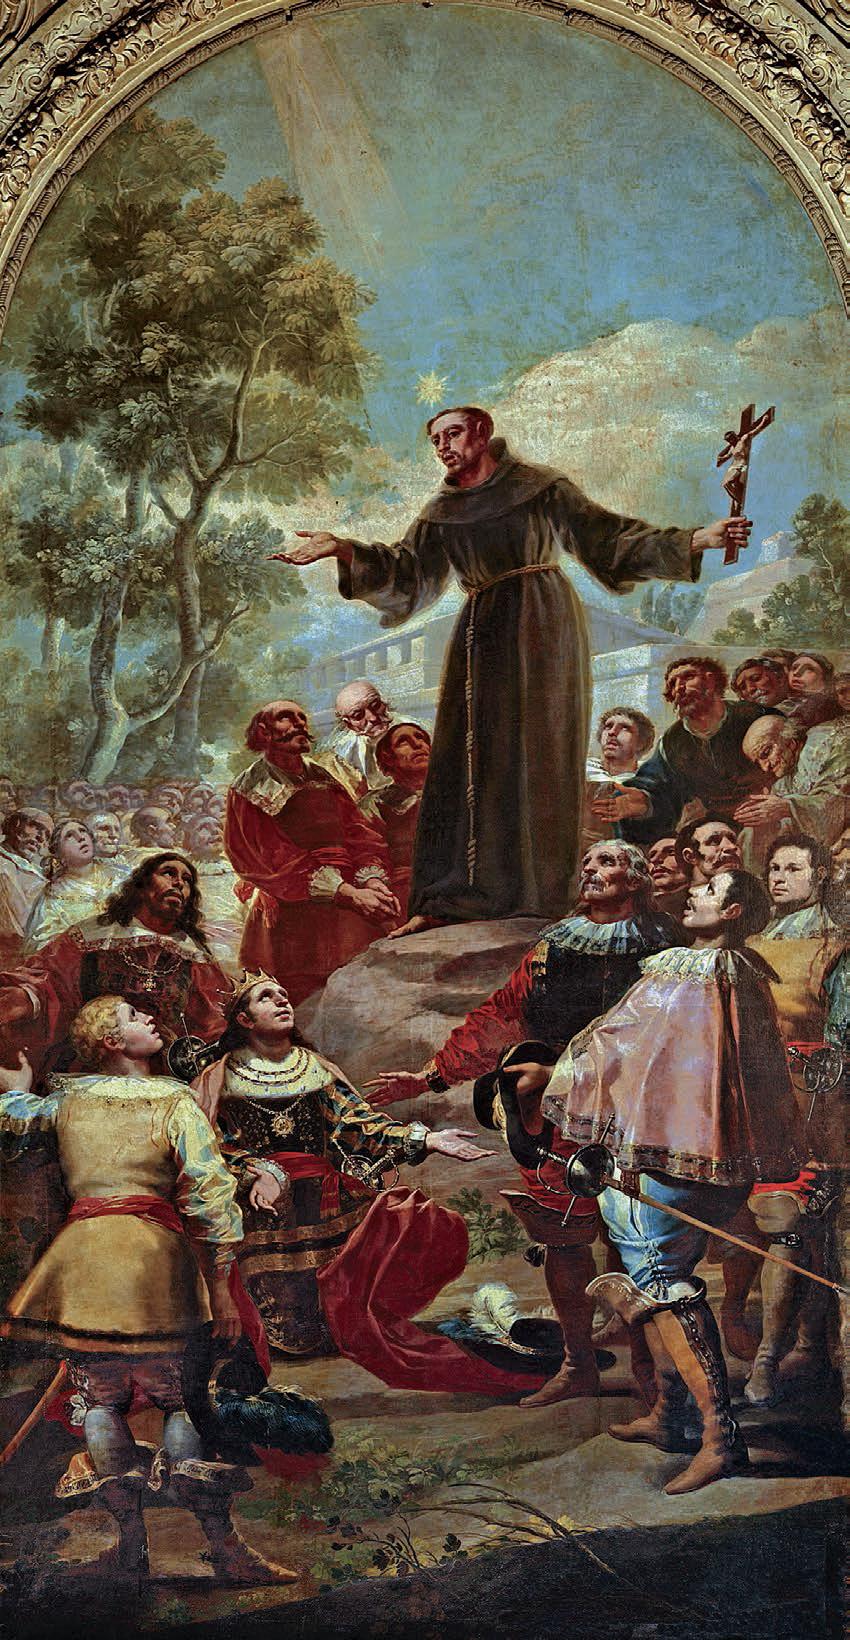 http://upload.wikimedia.org/wikipedia/commons/8/8e/San_Bernardino_de_Siena_(Goya).jpg